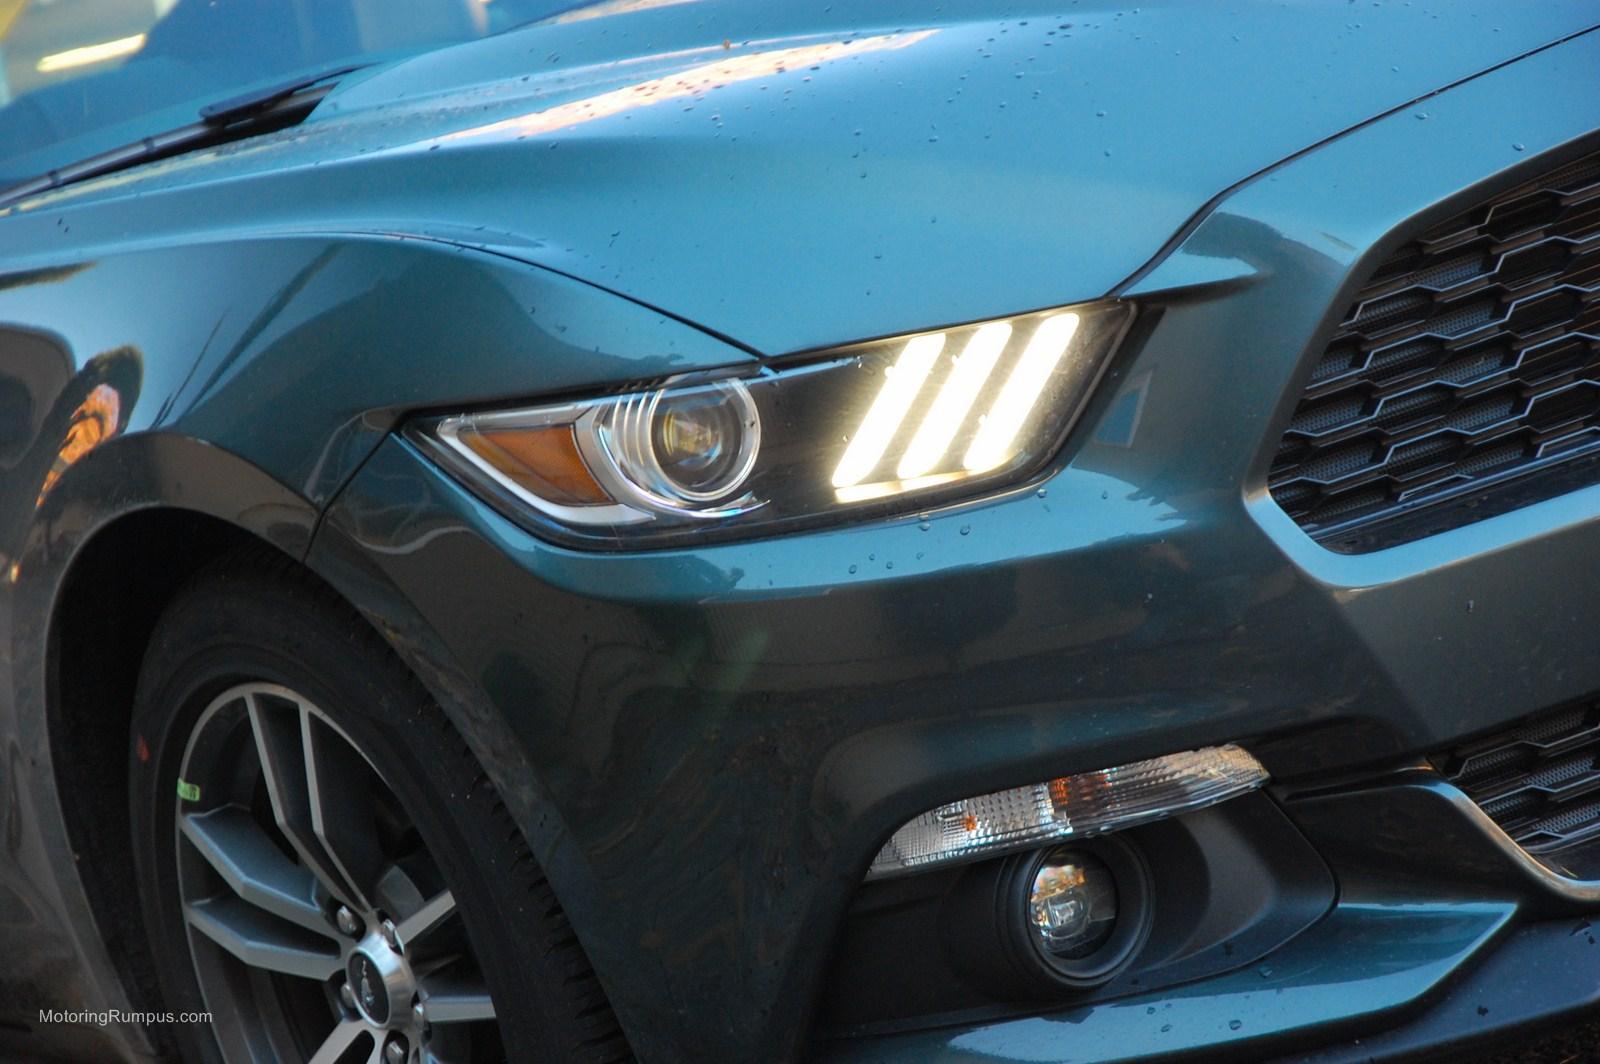 signature lighting. 2015 ford mustang drl signature lighting n